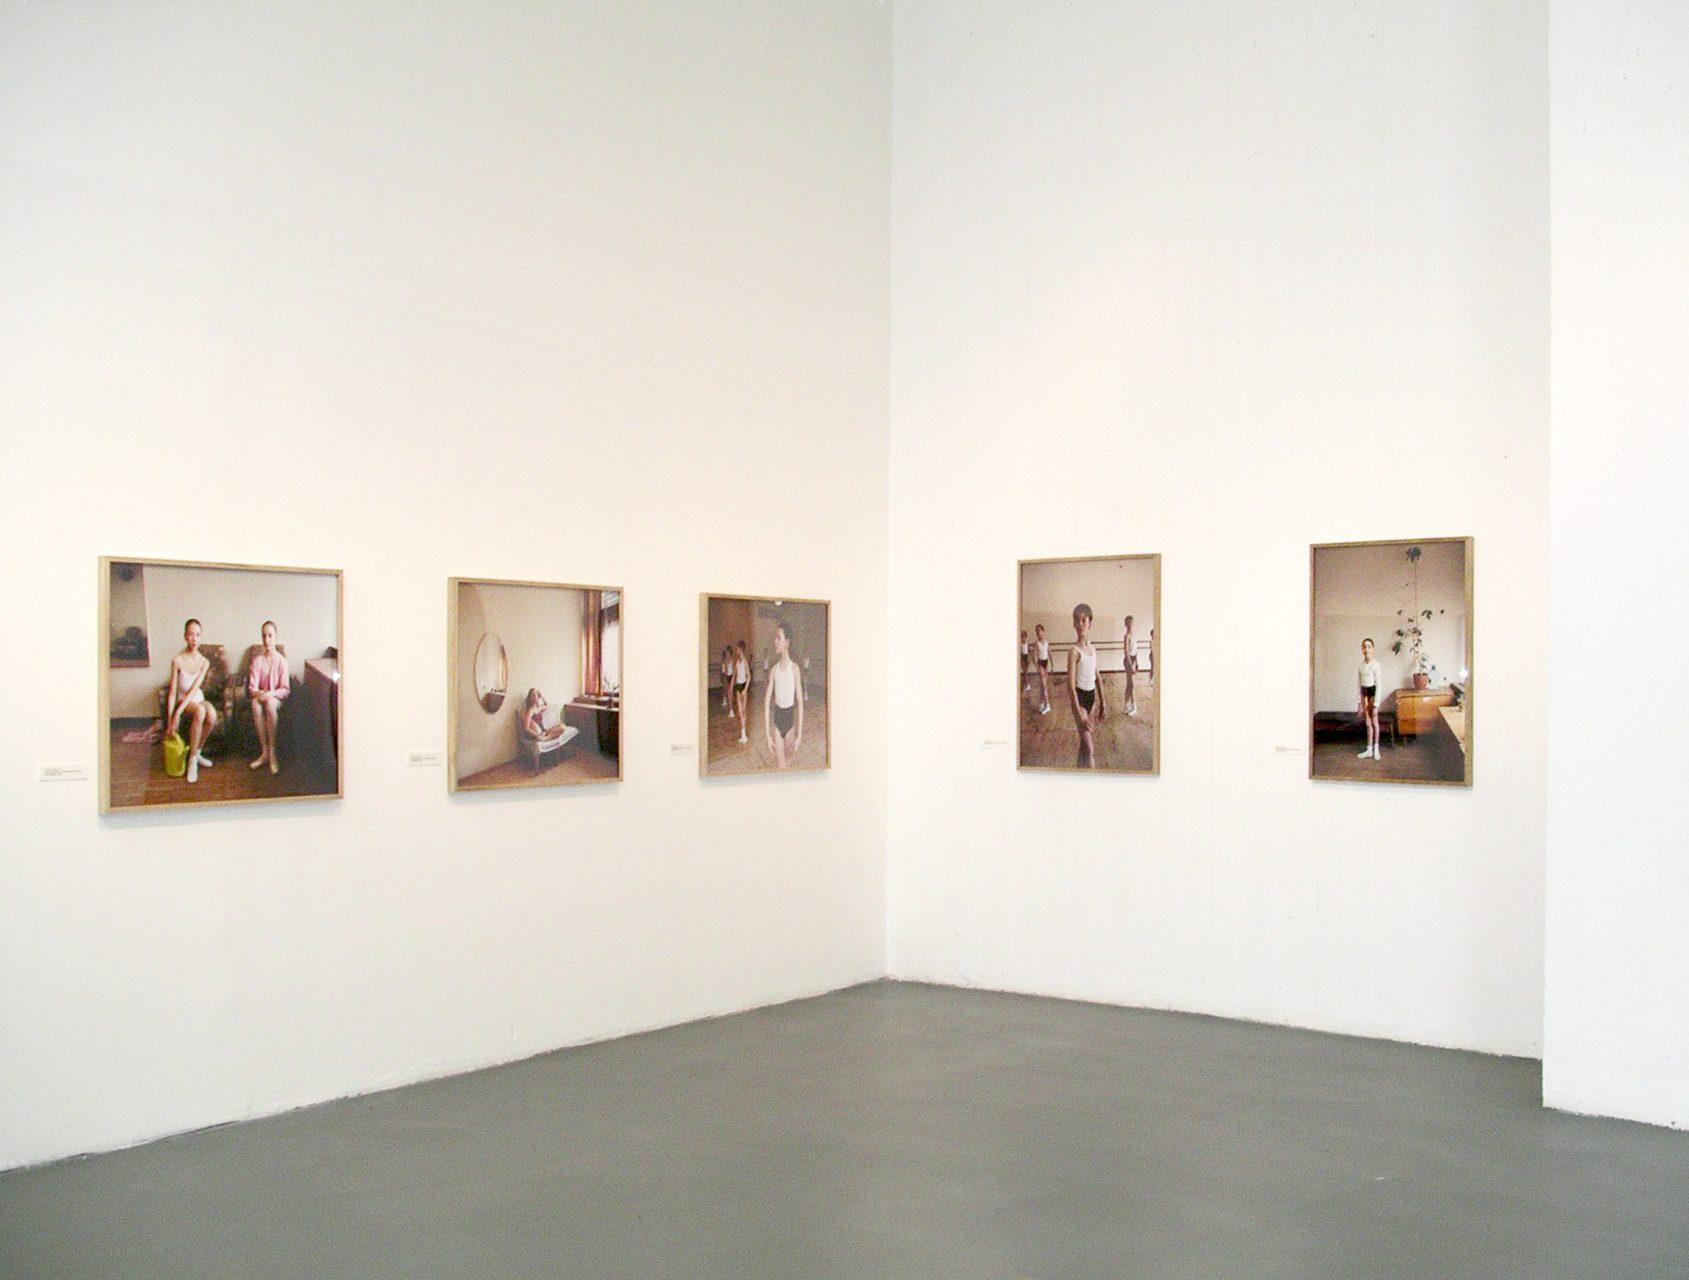 Anastasia Khoroshilova, Islanders 2003-2006, Centro per l'arte contemporanea Luigi Pecci, Prato, Italy, 2007